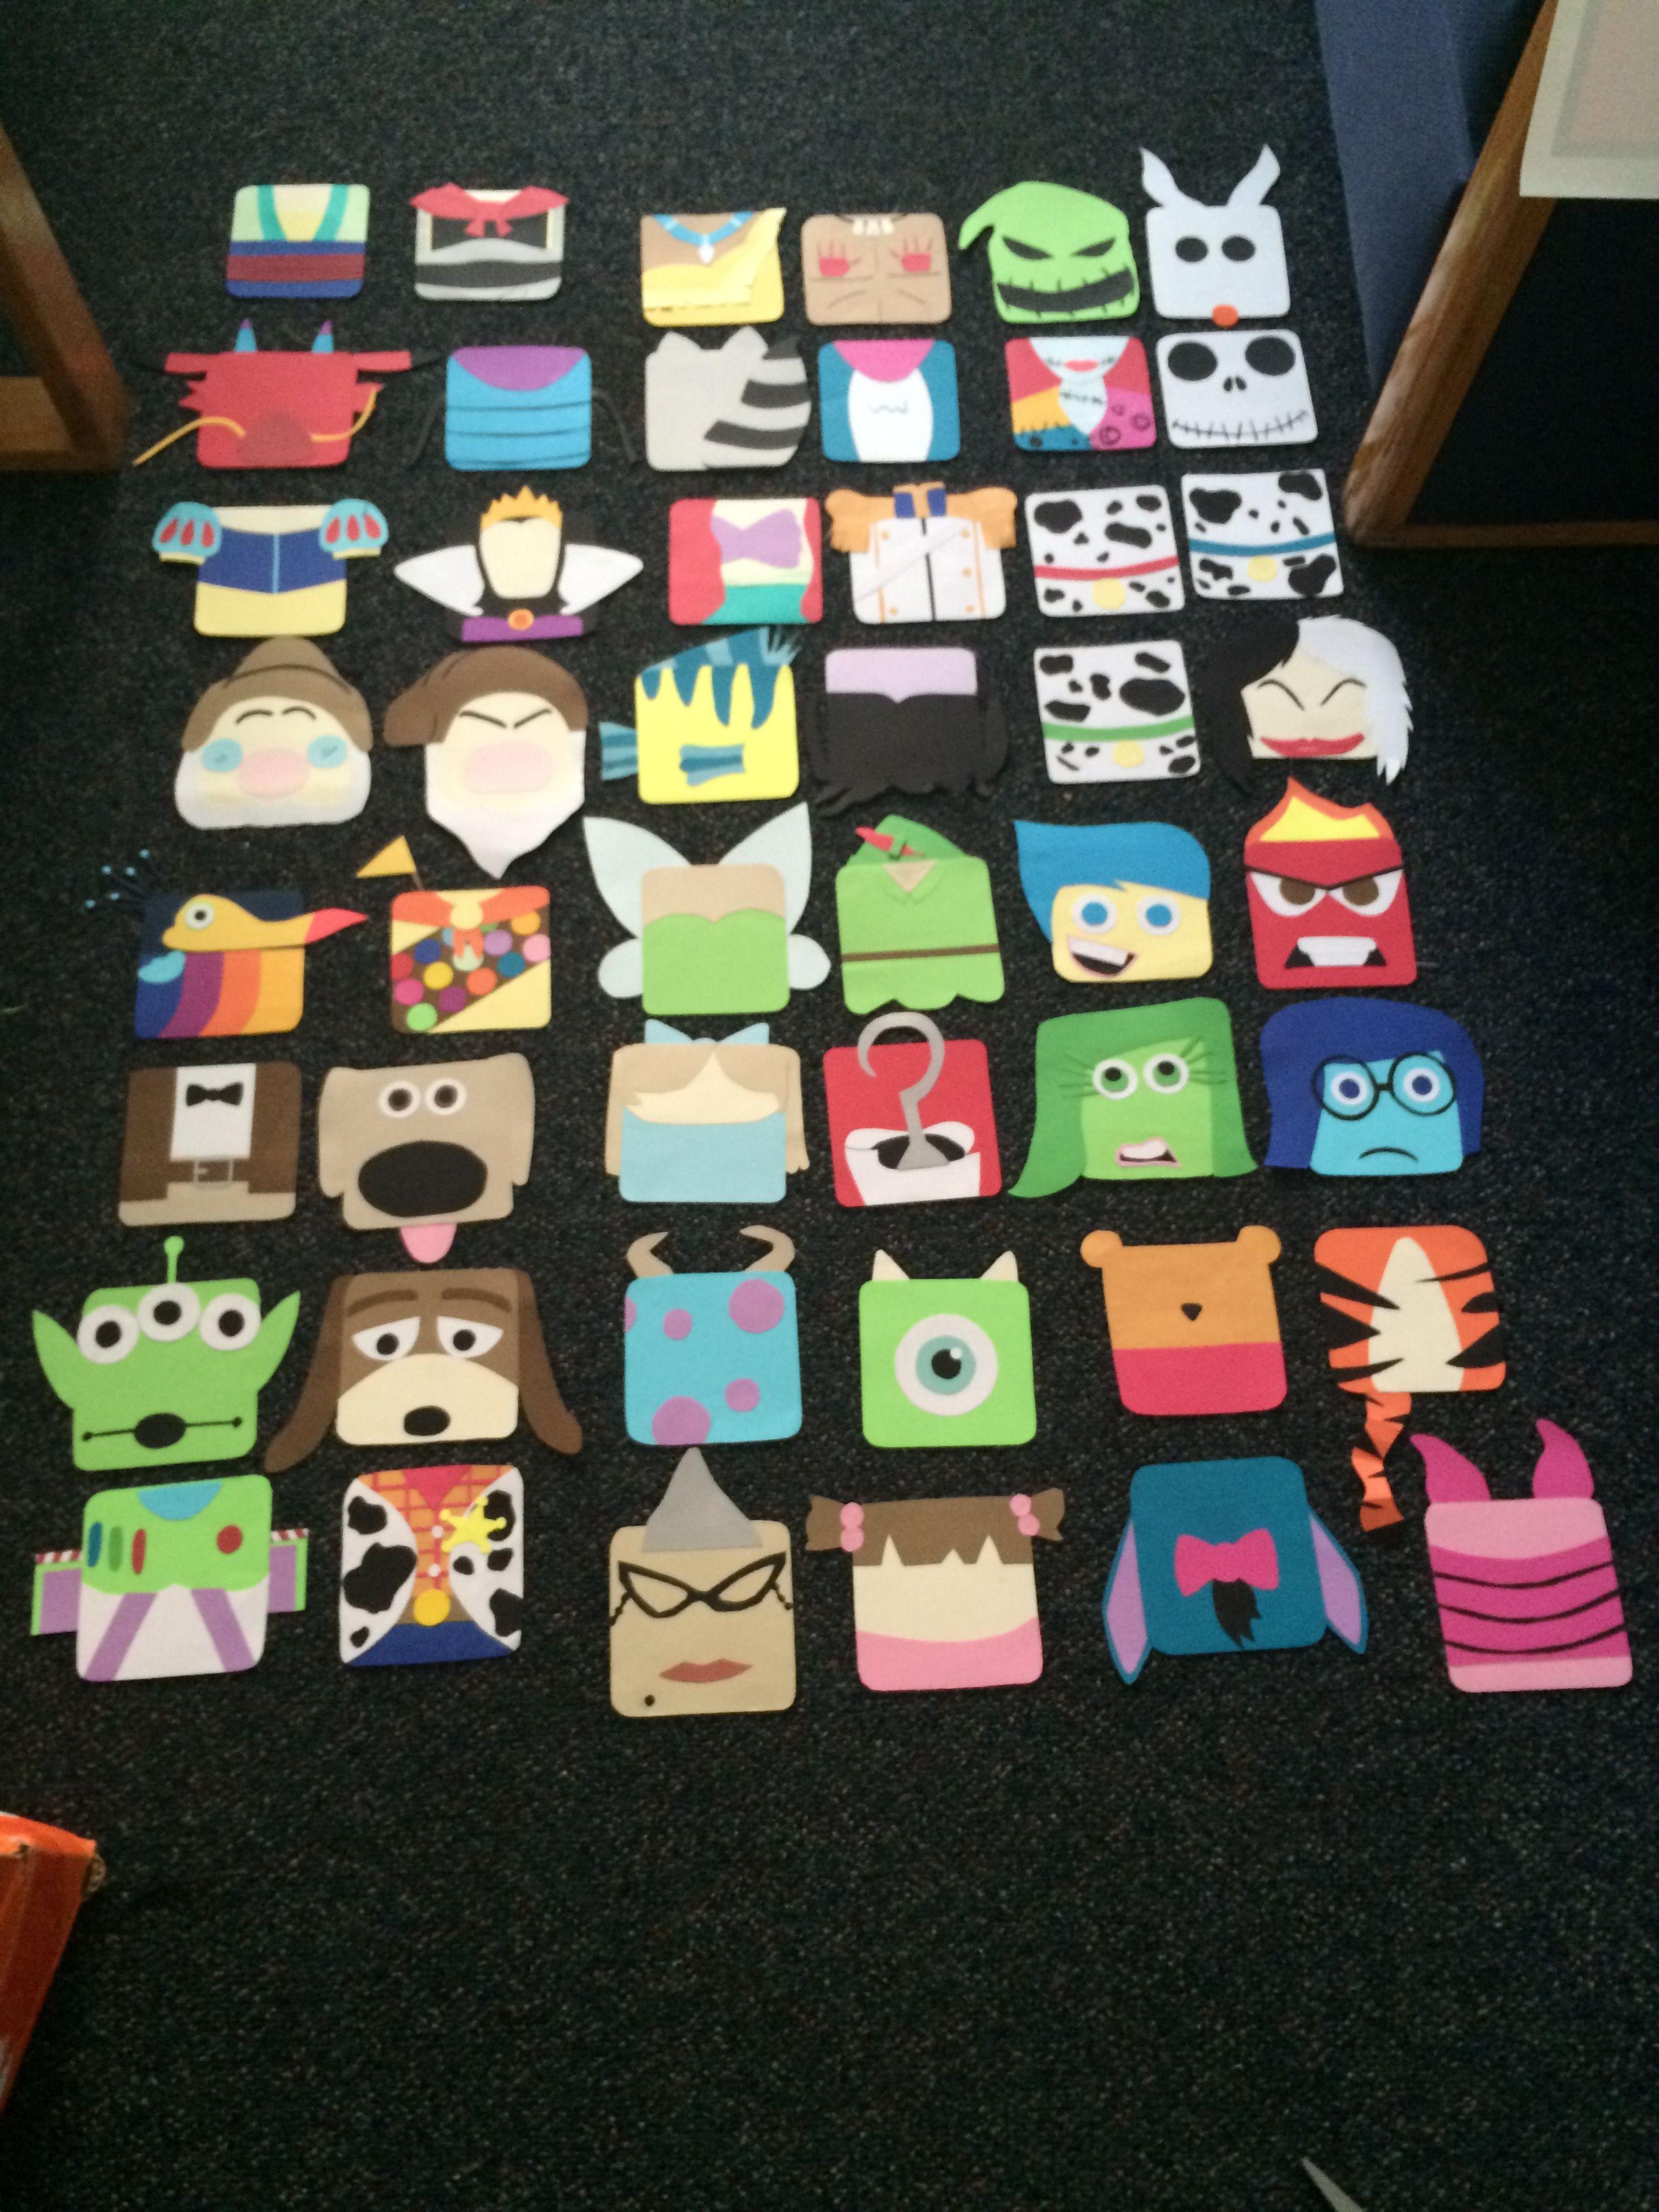 My Disney/Pixar door decs! (made entirely with card stock paper)   sc 1 st  Pinterest & My Disney/Pixar door decs! (made entirely with card stock paper ...